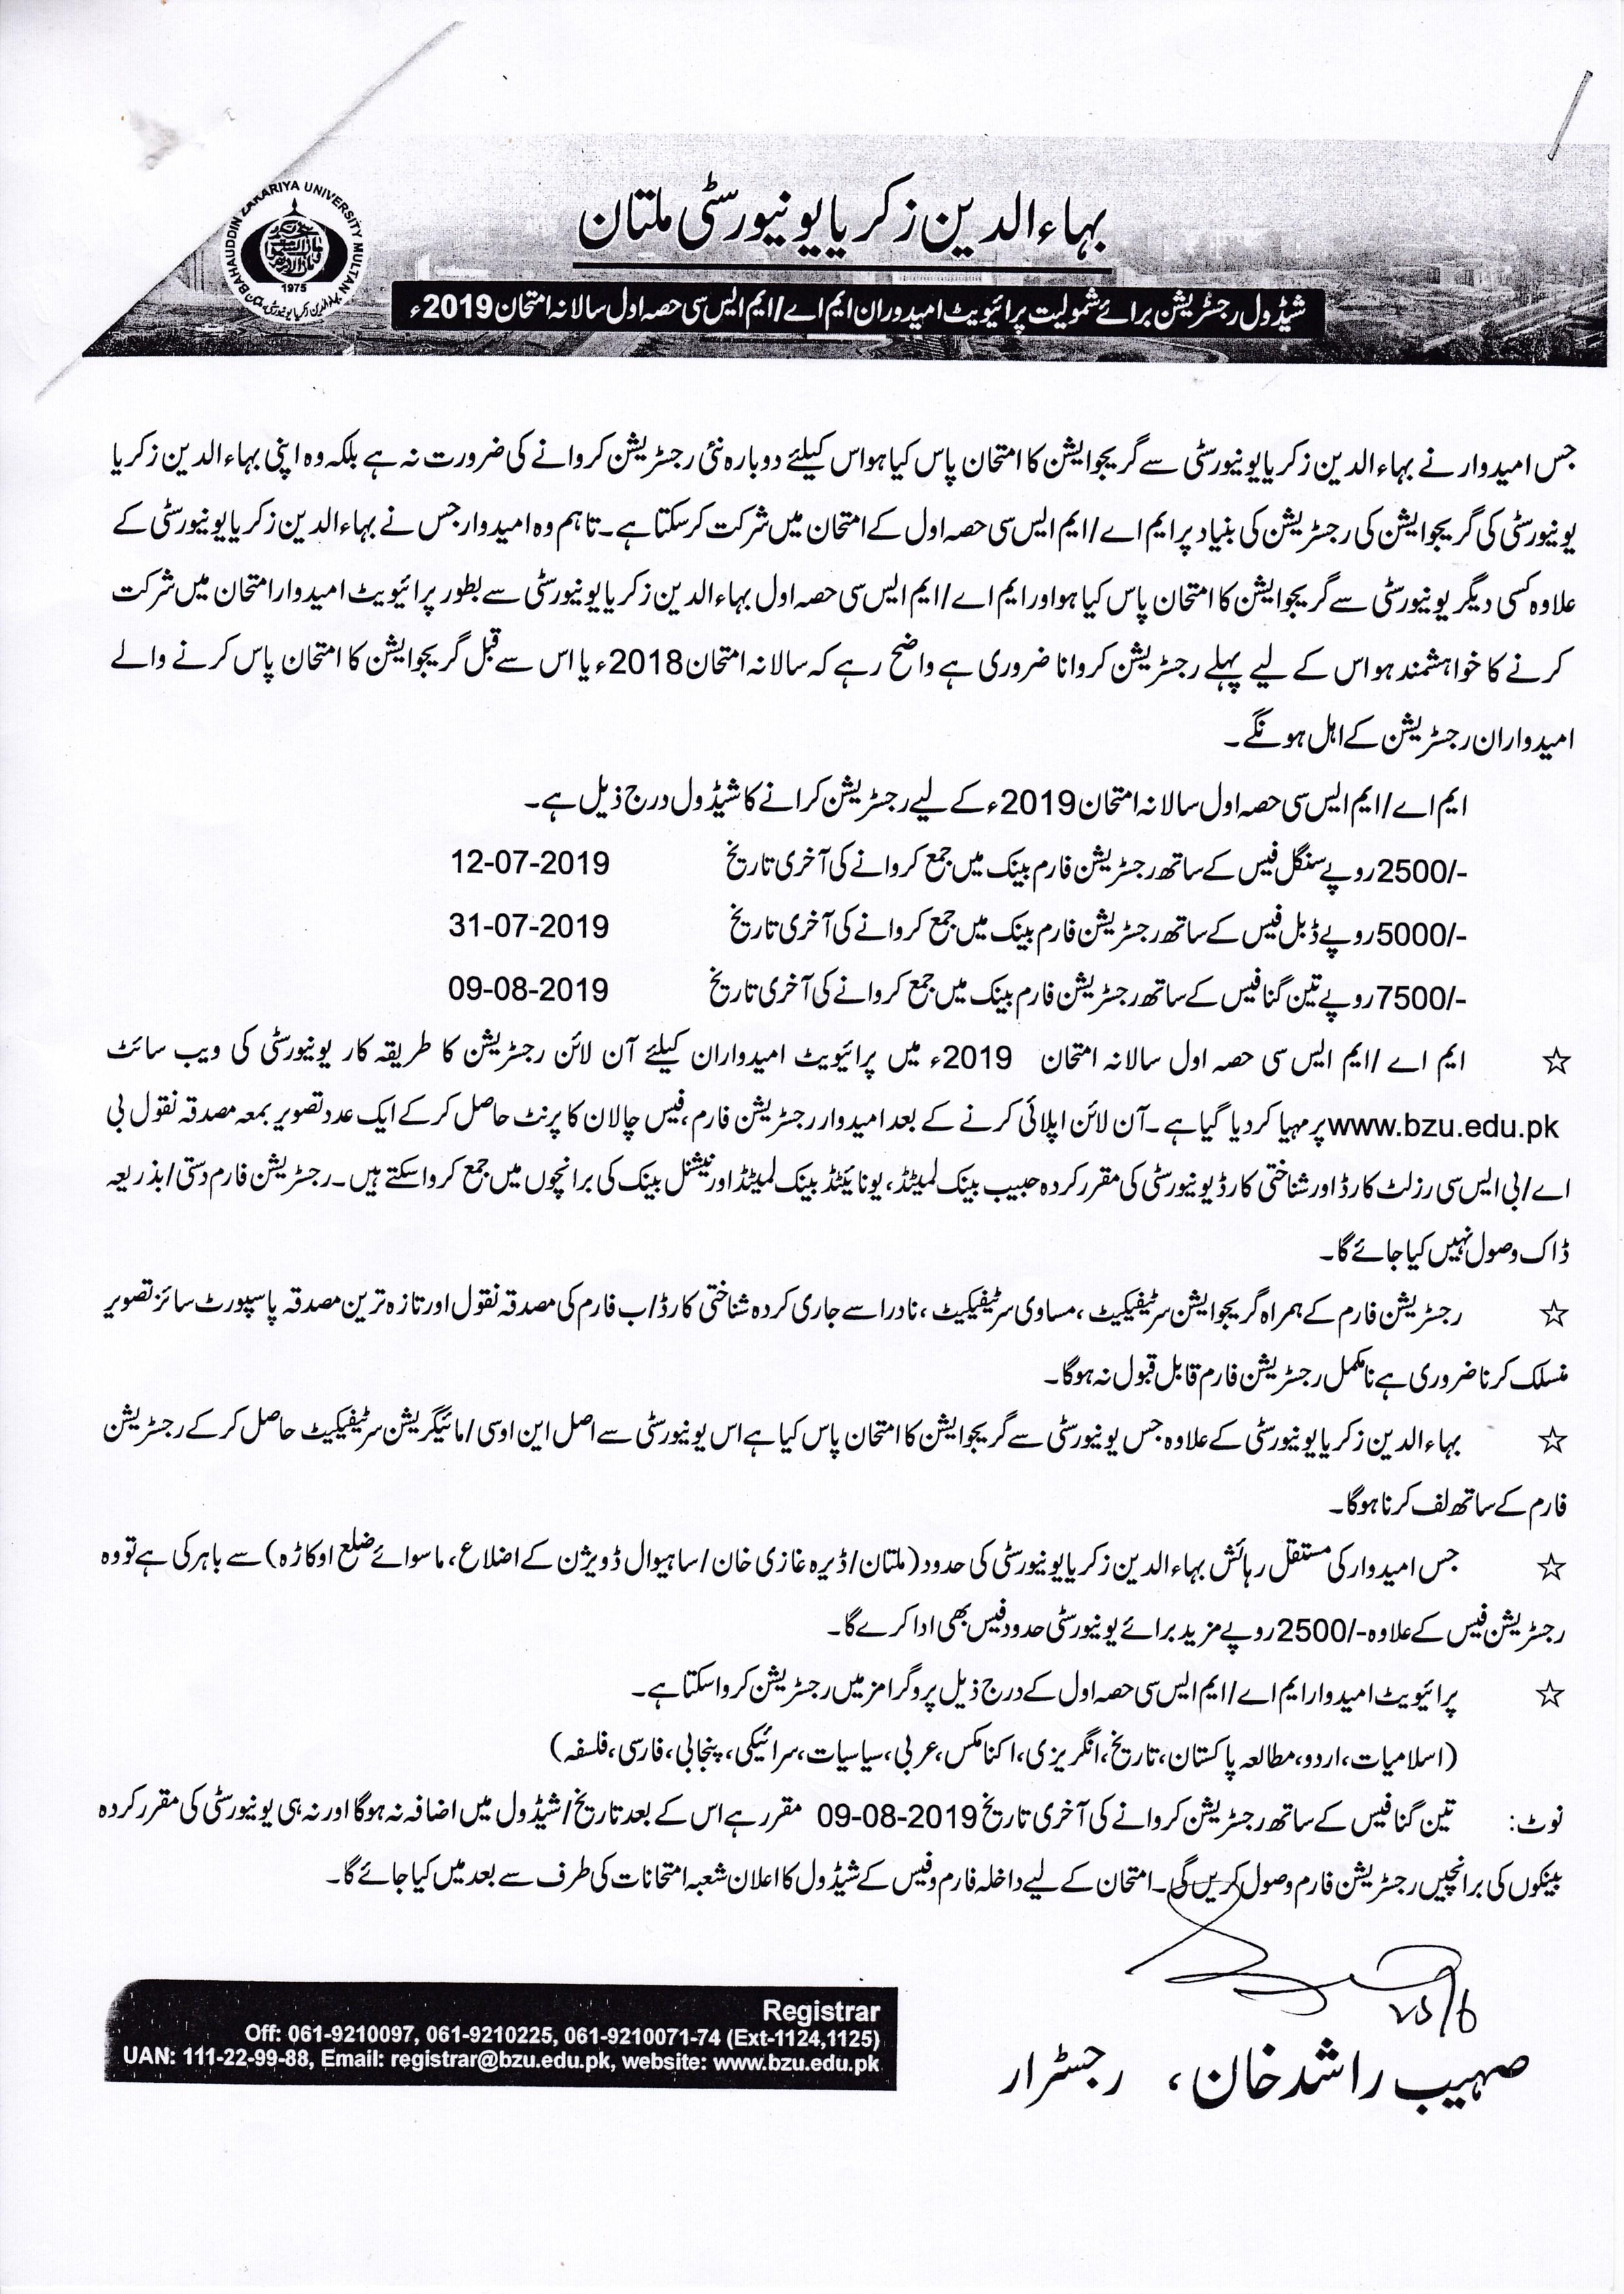 Bahauddin Zakariya University Admissions 2019 in School, College